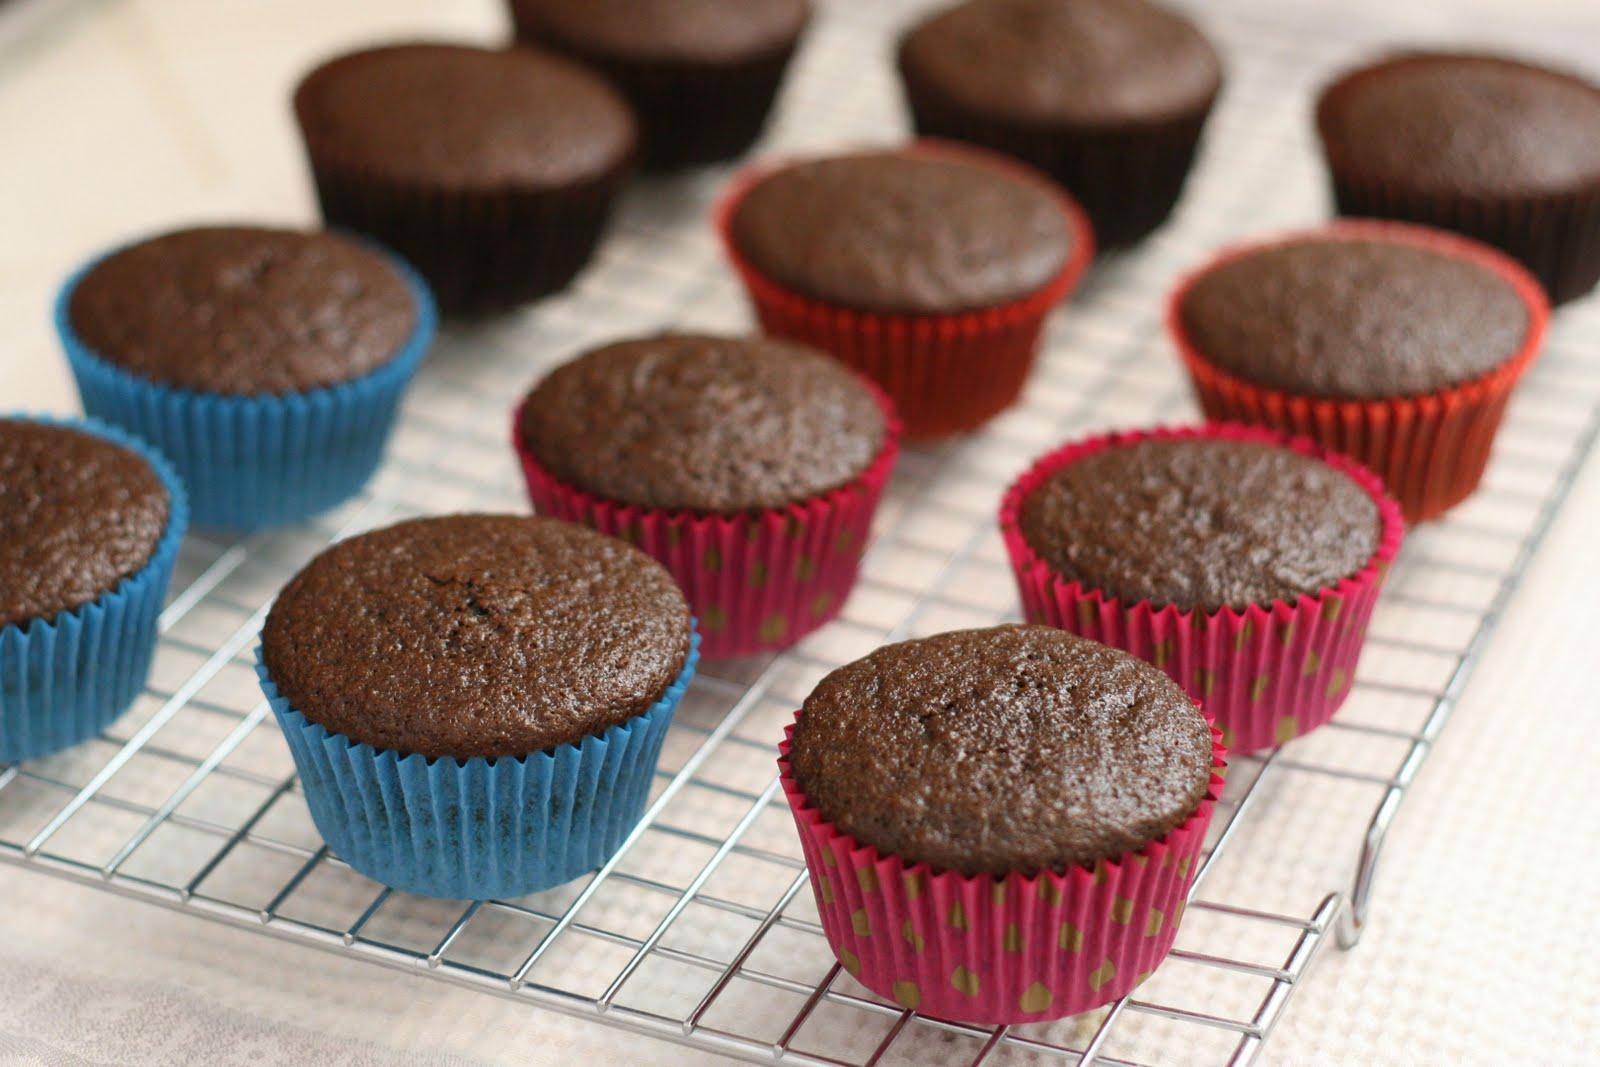 Cupcake Basics How To Bake Cupcakes